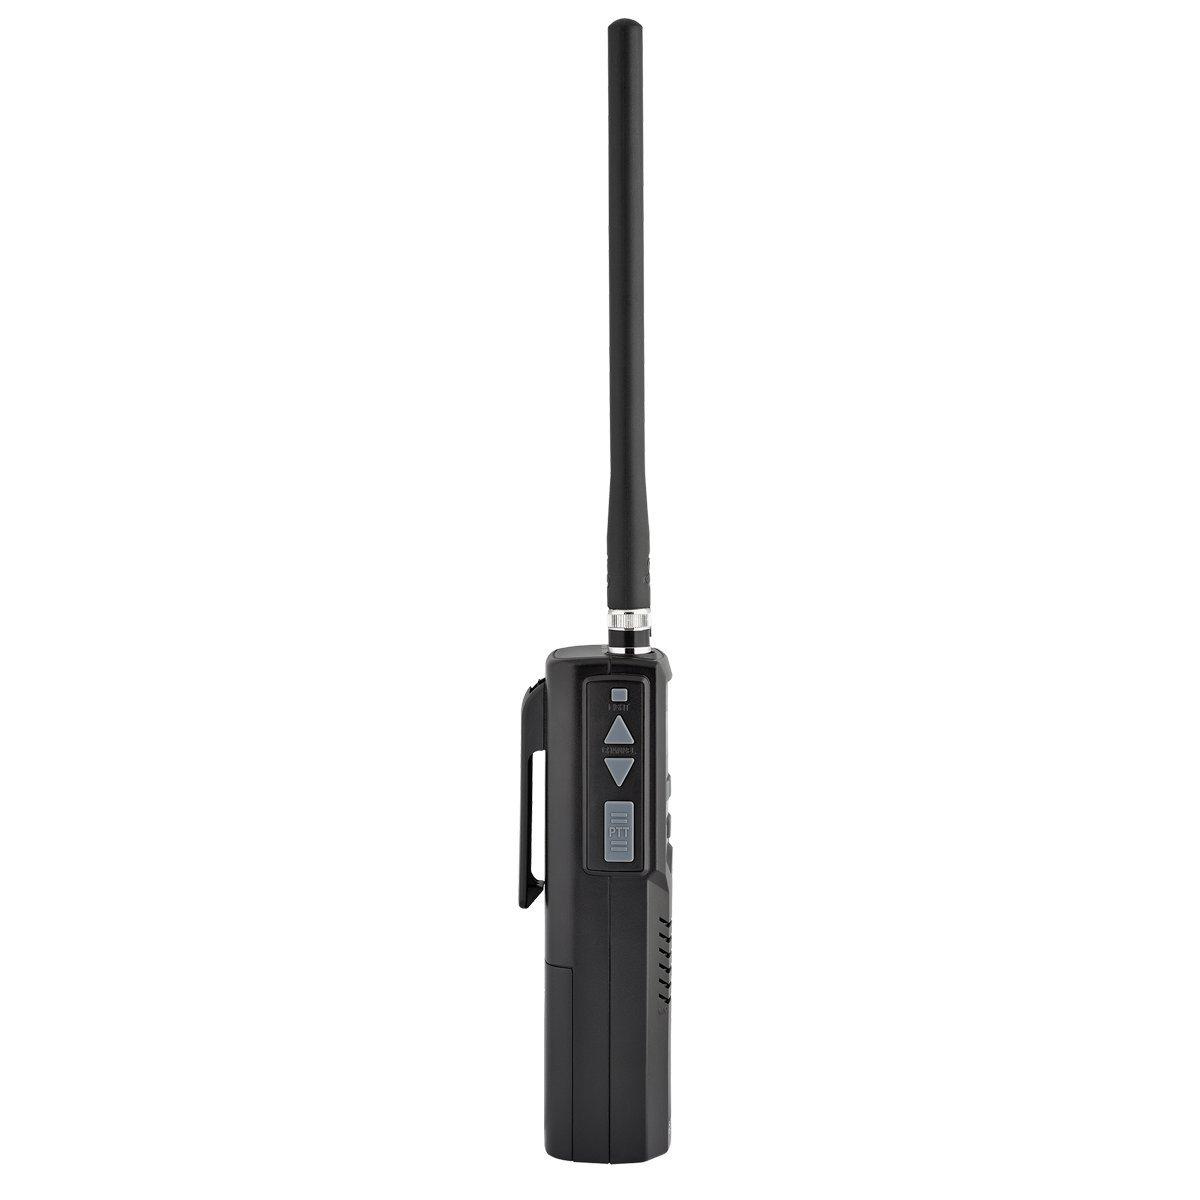 Cobra Electronics HH50WXST Citizens Band 2-Way Handheld CB Radio, Black